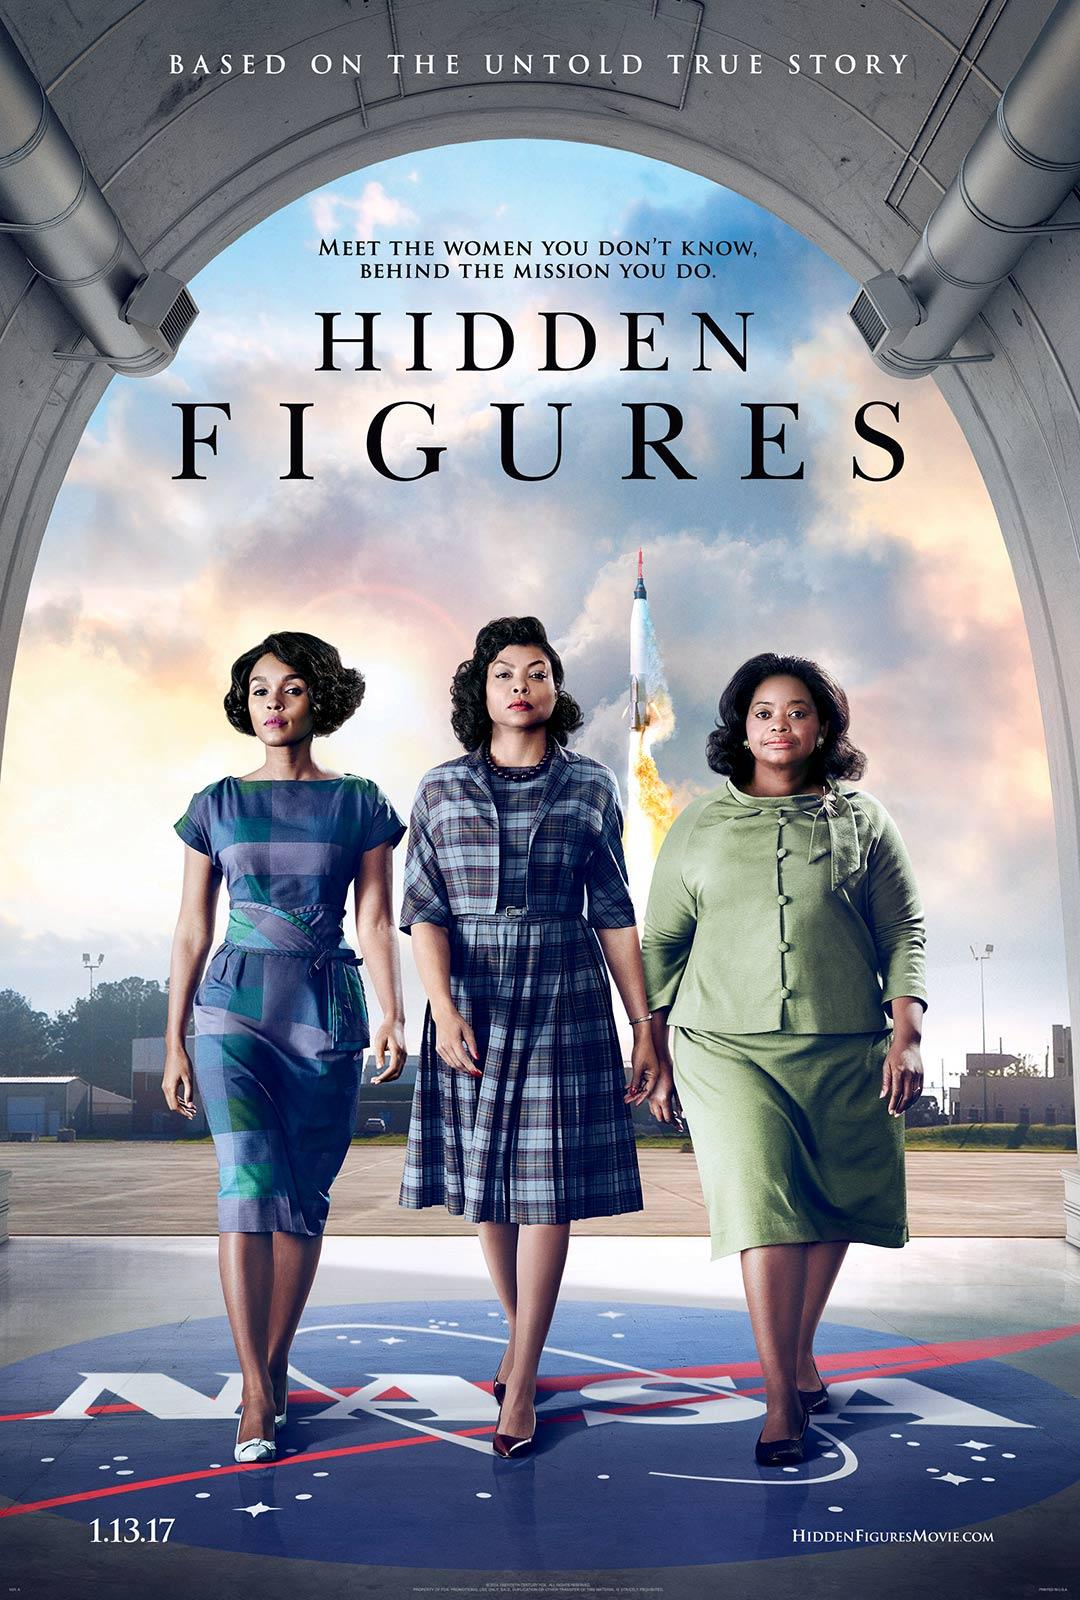 A look Inside 'Hidden Figures' with Director Ted Melfi